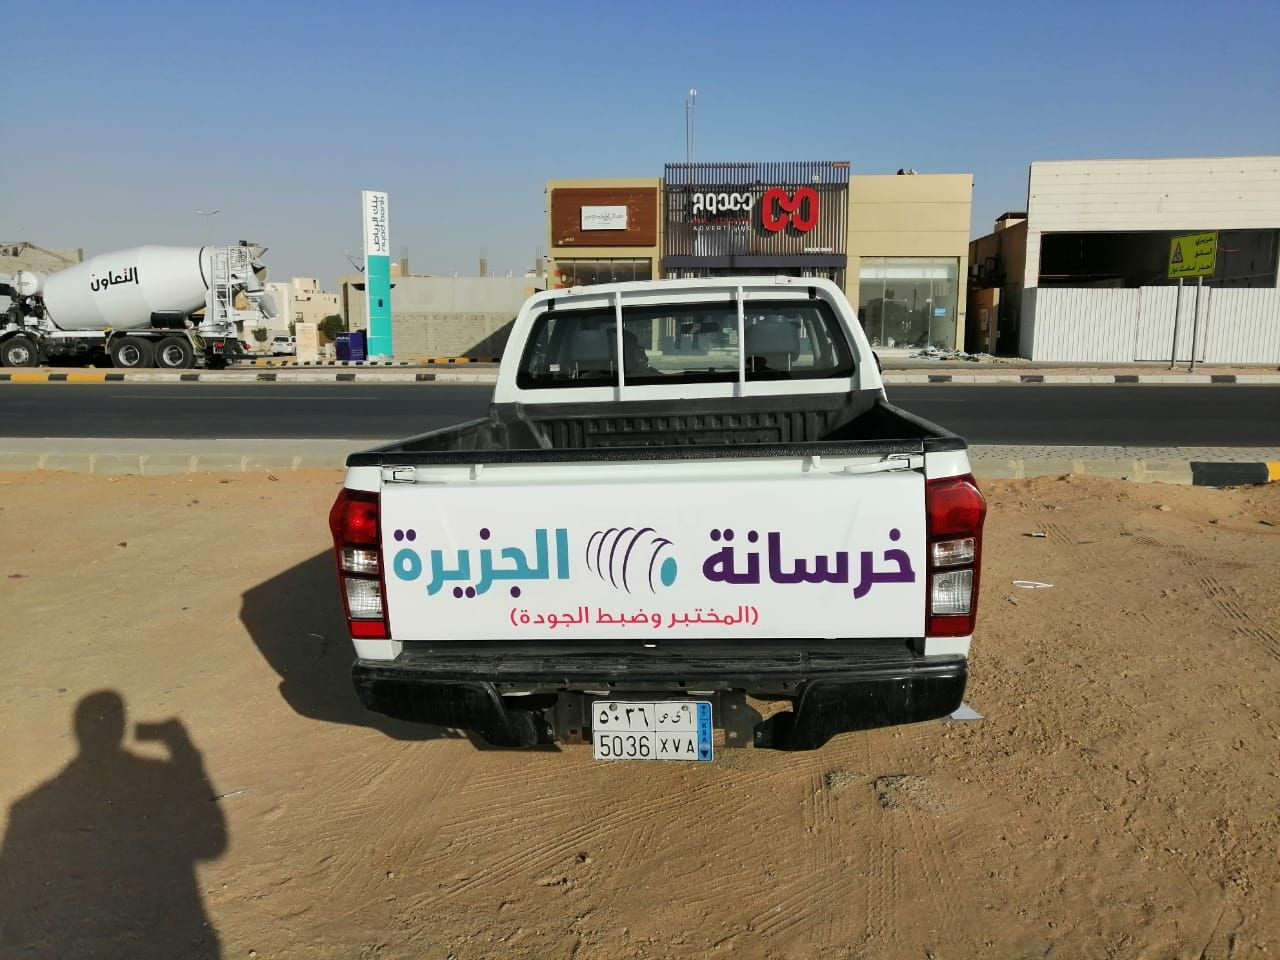 Pin By ممدوح للدعاية والإعلان Mamdouh On Car Stickers استيكرات سيارات Vehicles Car